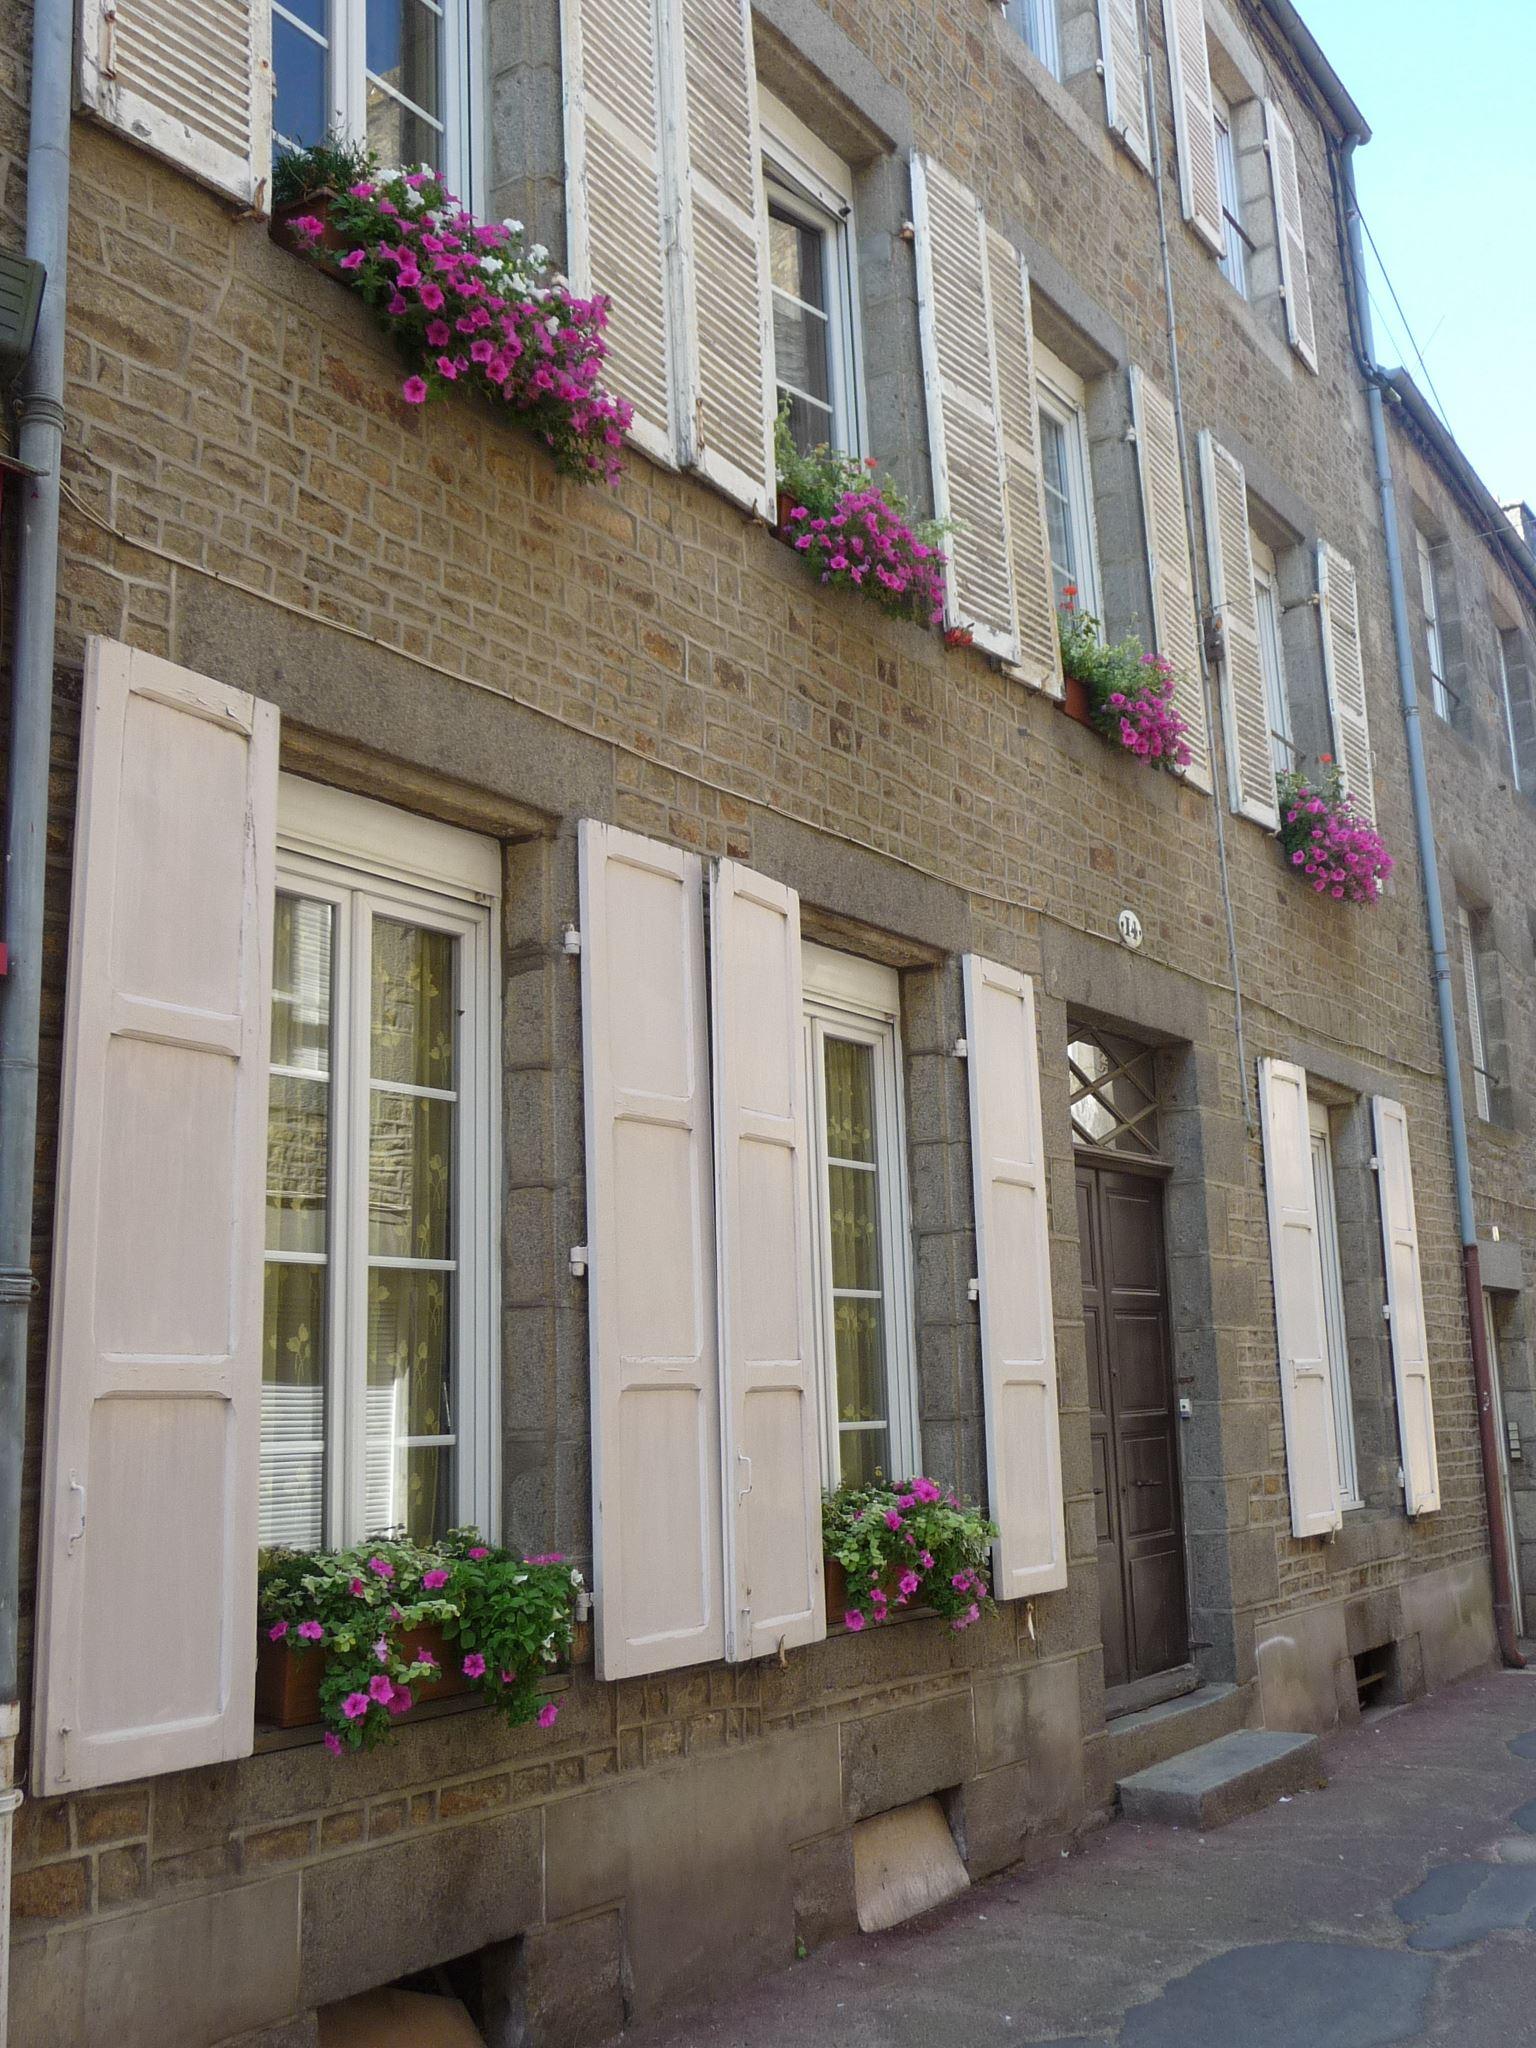 14 Rue pomme d'or_compressed